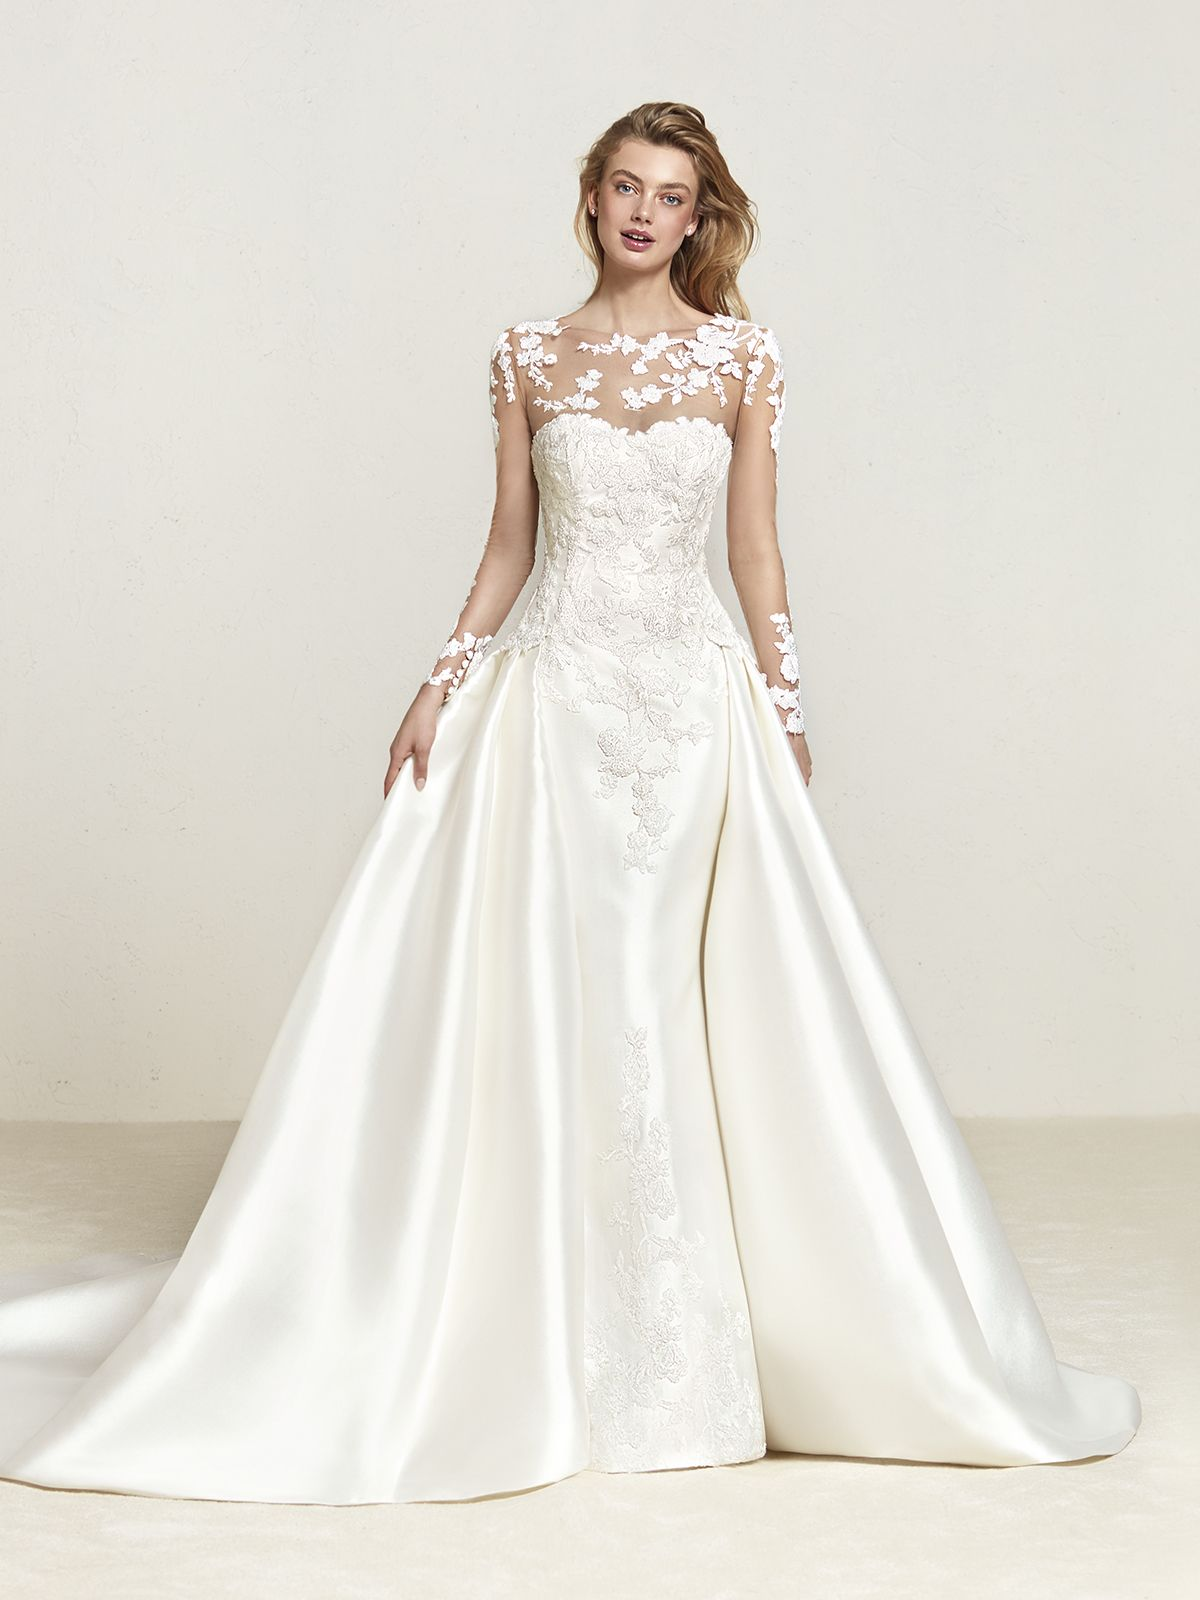 Allison williams wedding dress  Vestido de Novia de Pronovias DRALINE corte evasé escote ilusión